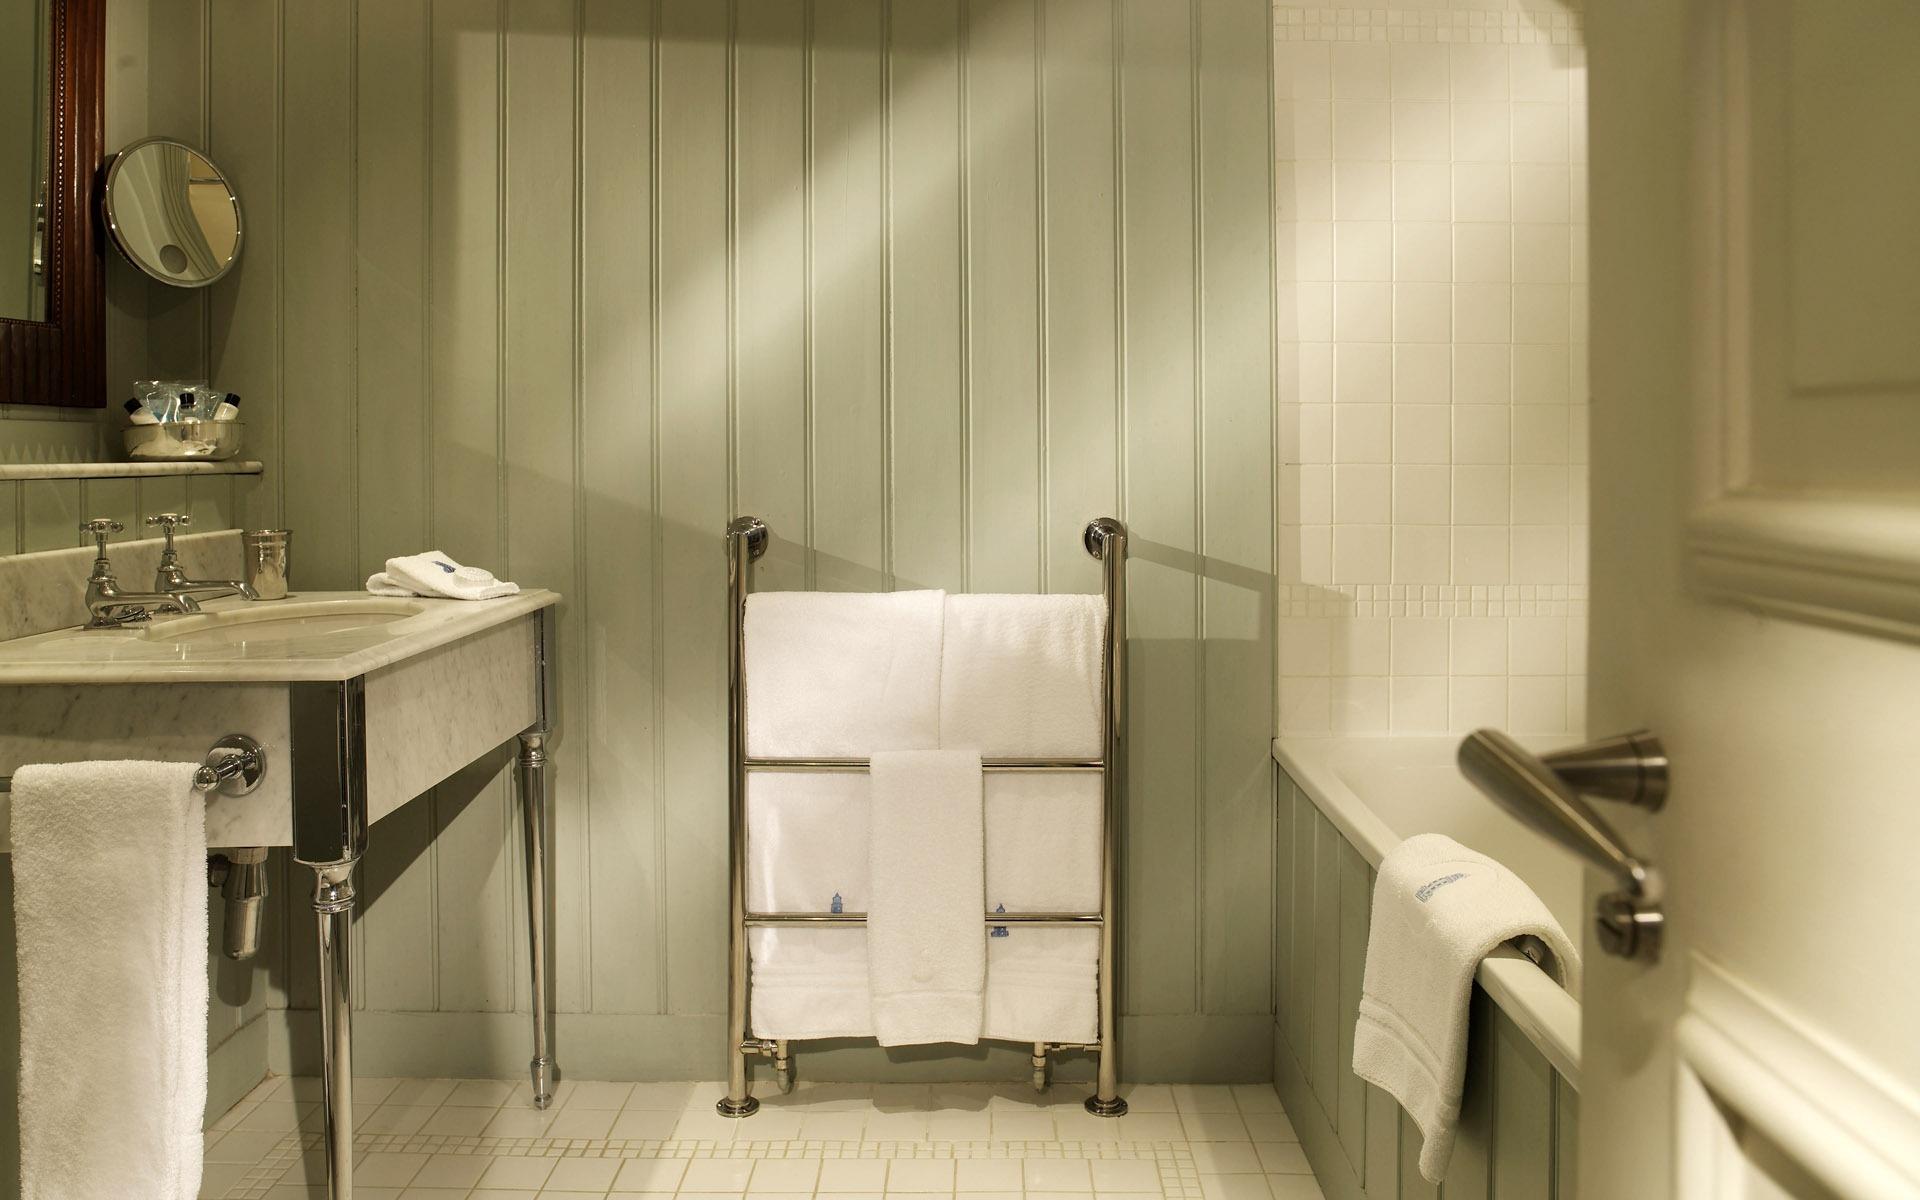 Fond d 39 cran photo salle de bain 3 2 1920x1200 fond d for Ecran salle de bain